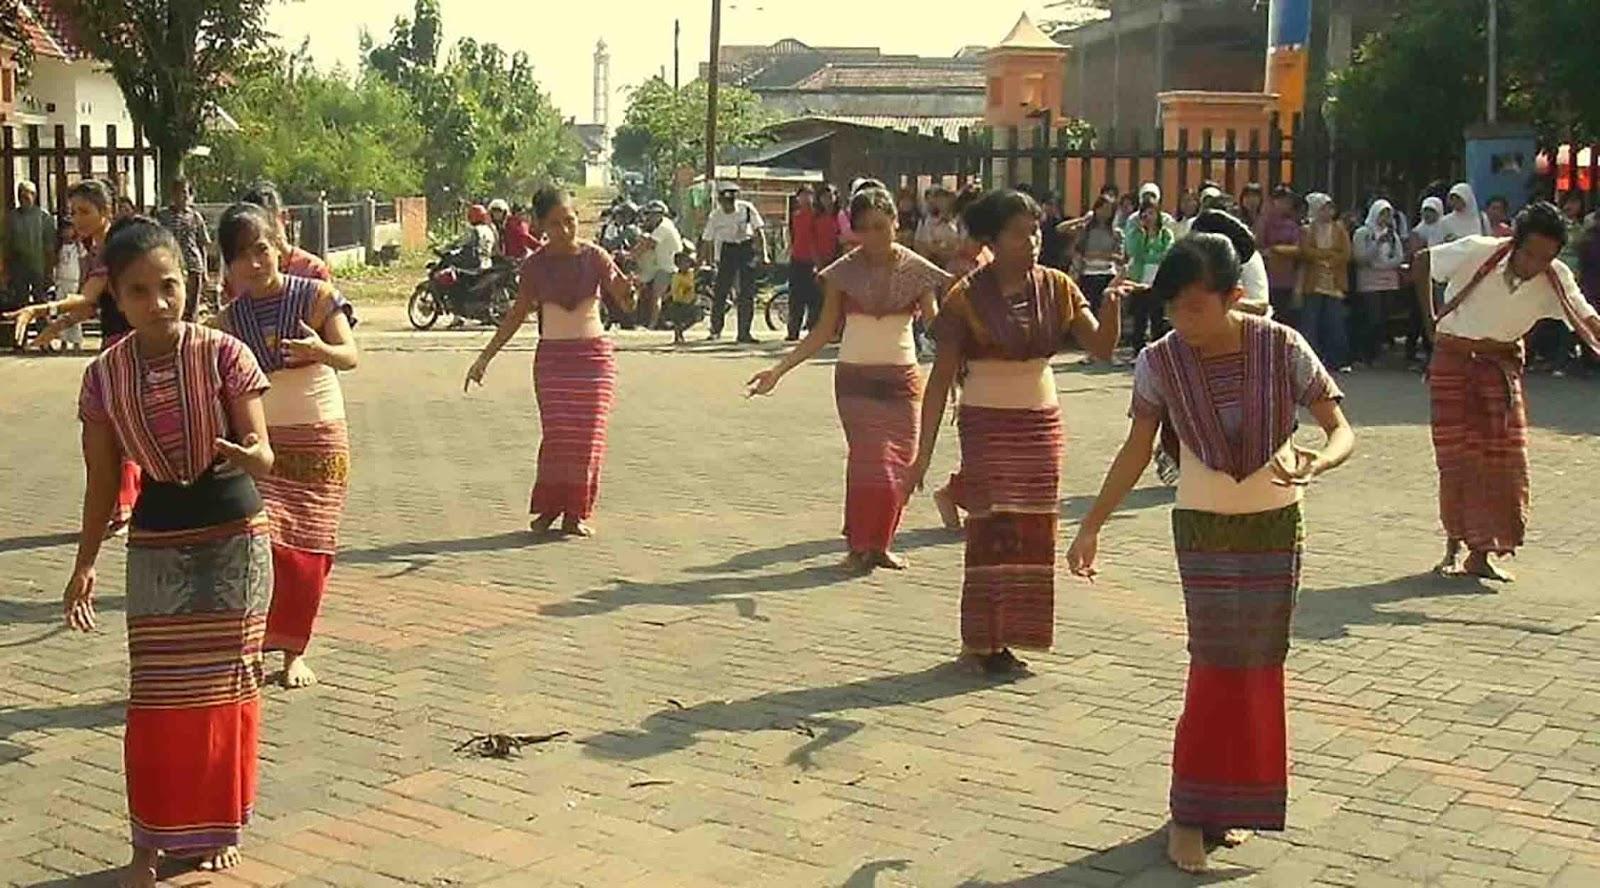 Tari Bidu, Tarian Tradisional Dari Belu Provinsi NTT